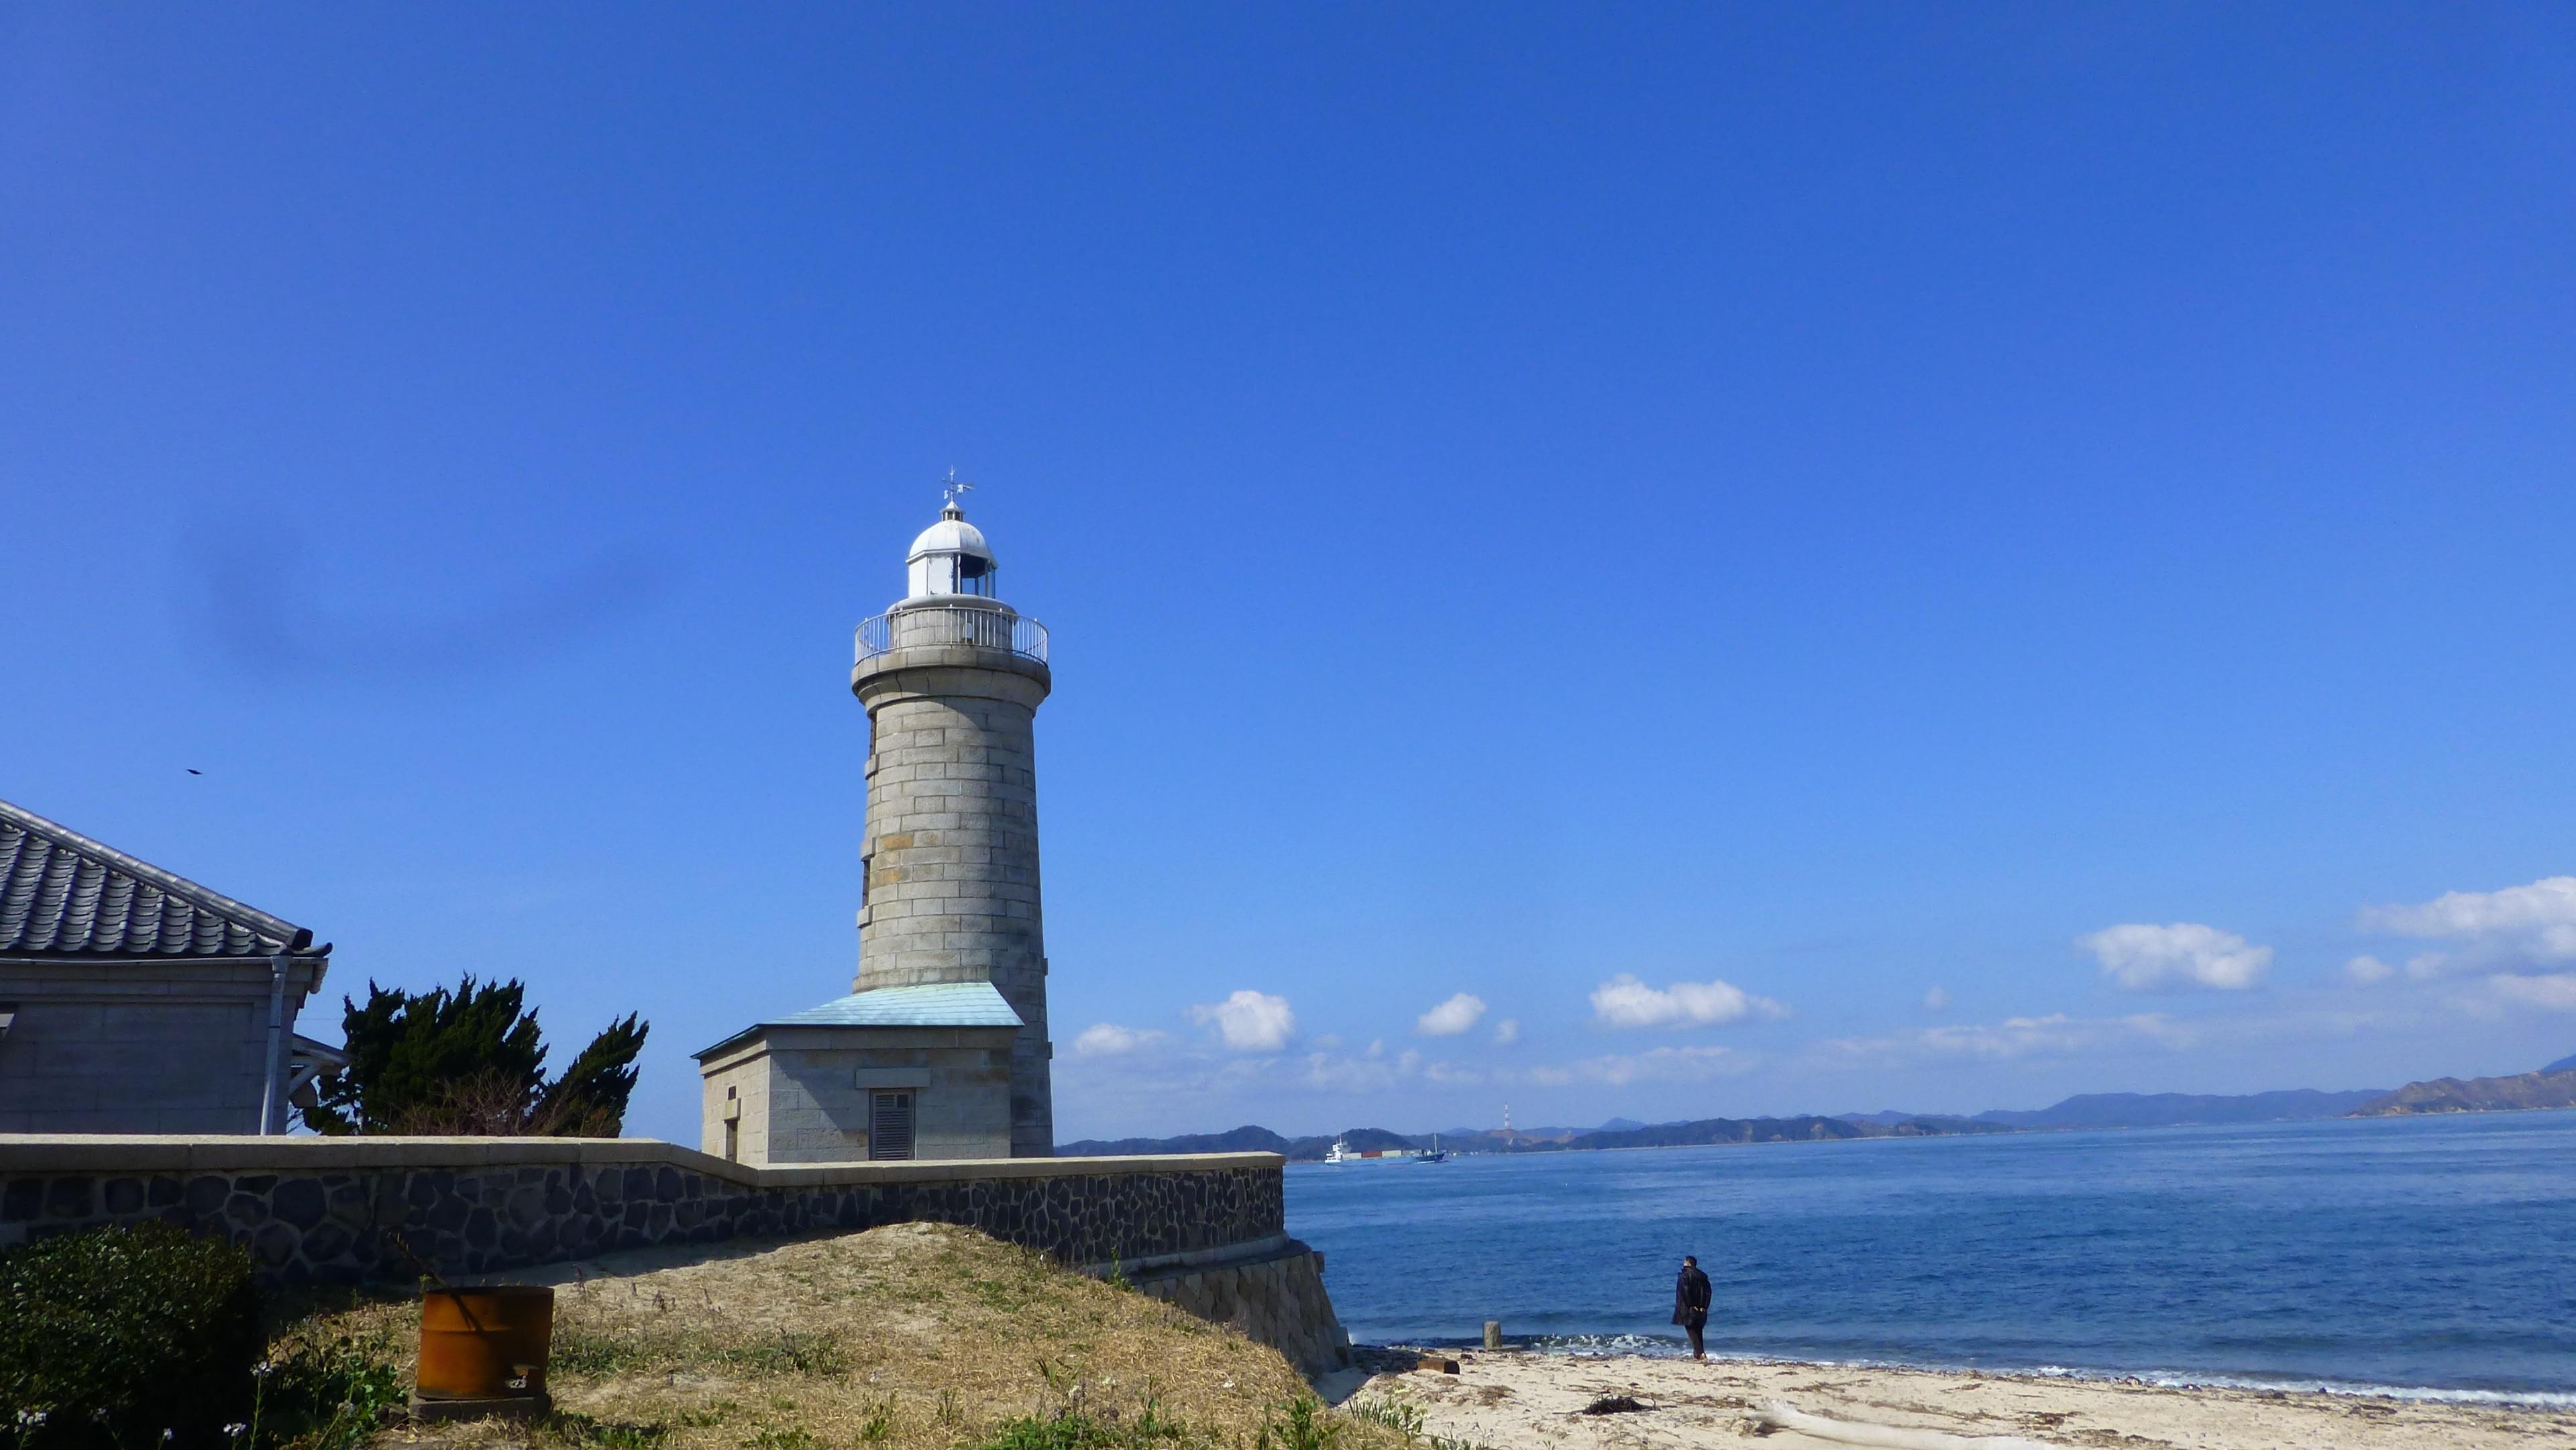 Ogijima Island, Kagawa Prefecture, Japan